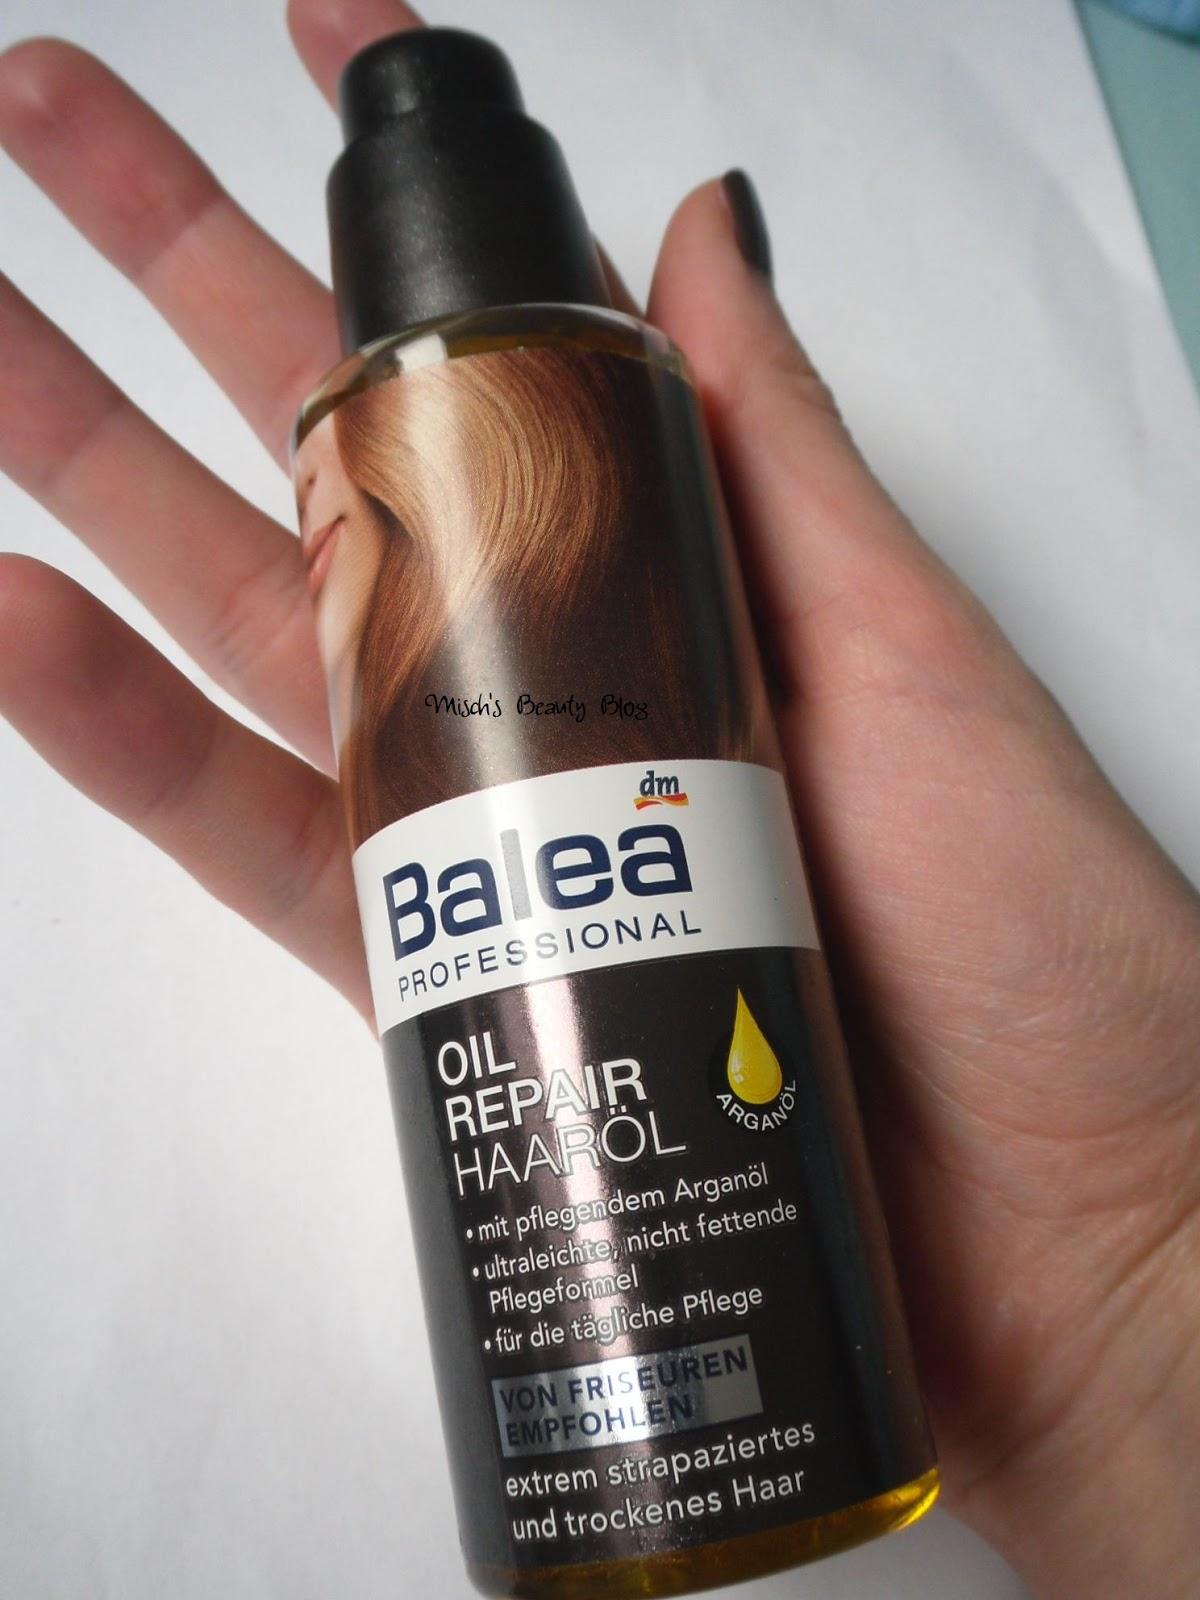 misch s beauty blog review balea professional oil repair hair oil